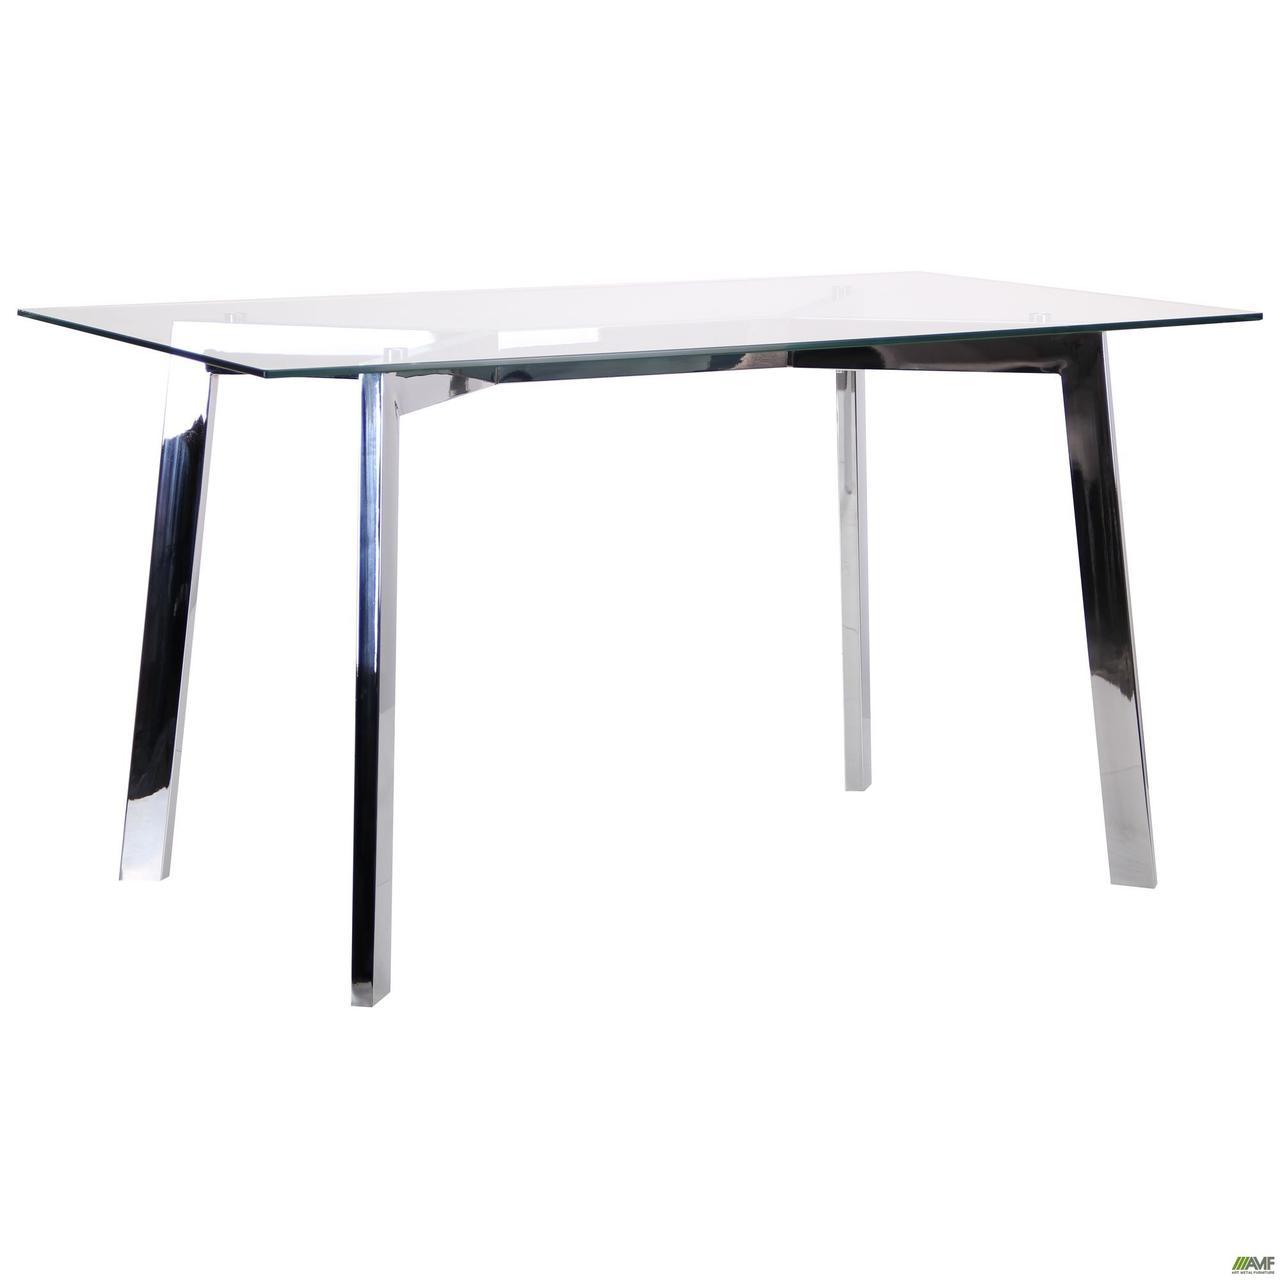 Стол обеденный Луиджи DT-1610 хром/стекло прозрачное